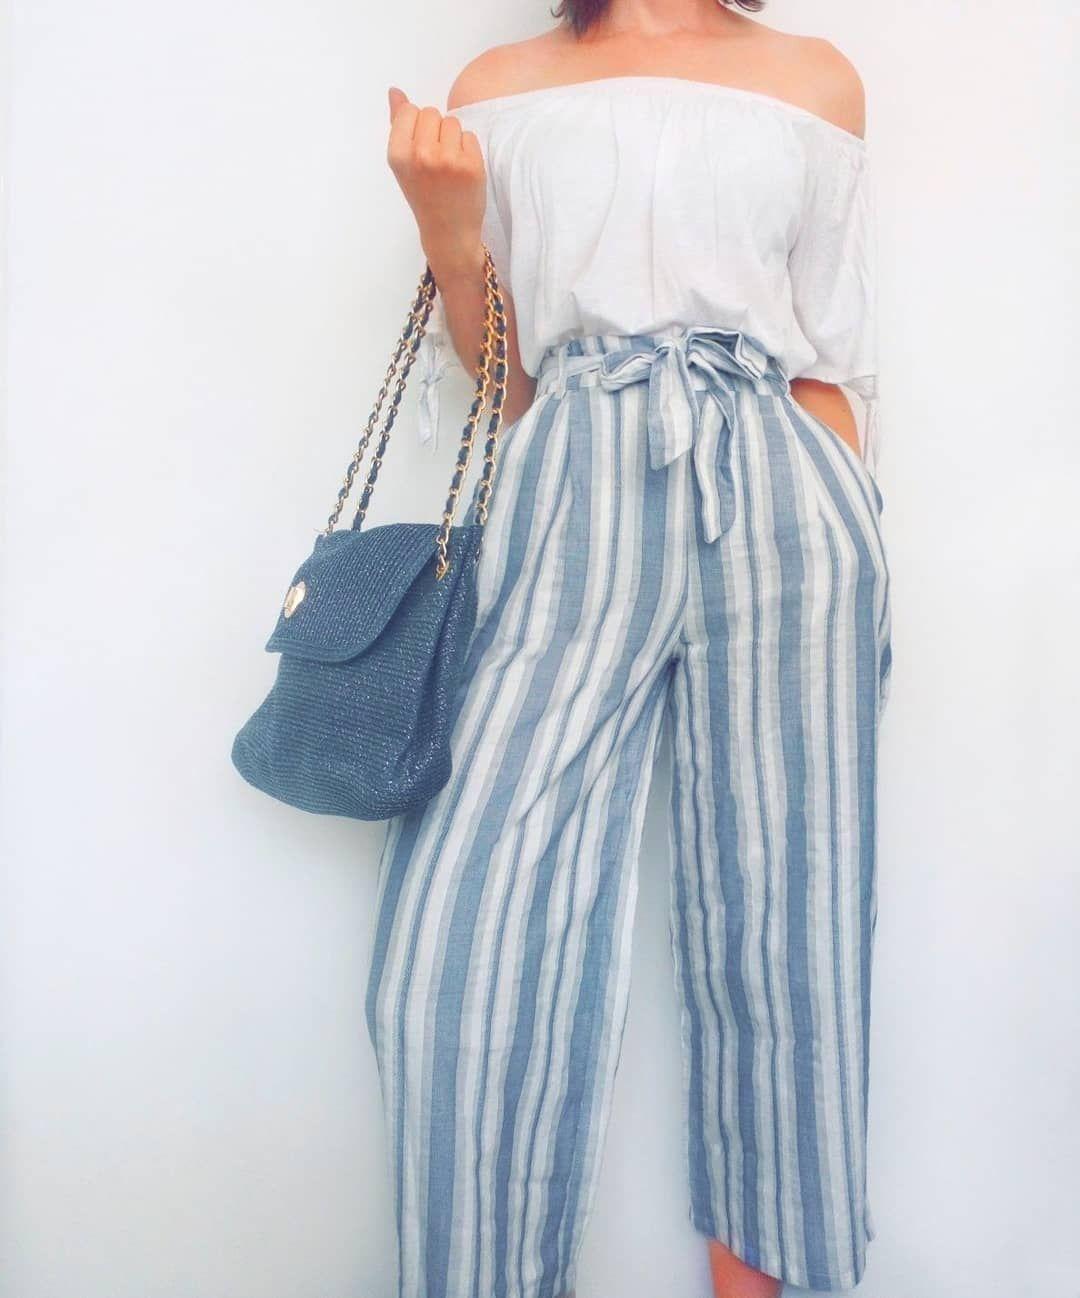 21b3b23cf8 Striped stripe high waisted paper bag tie waist wide leg trousers tie  sleeve white bardot top